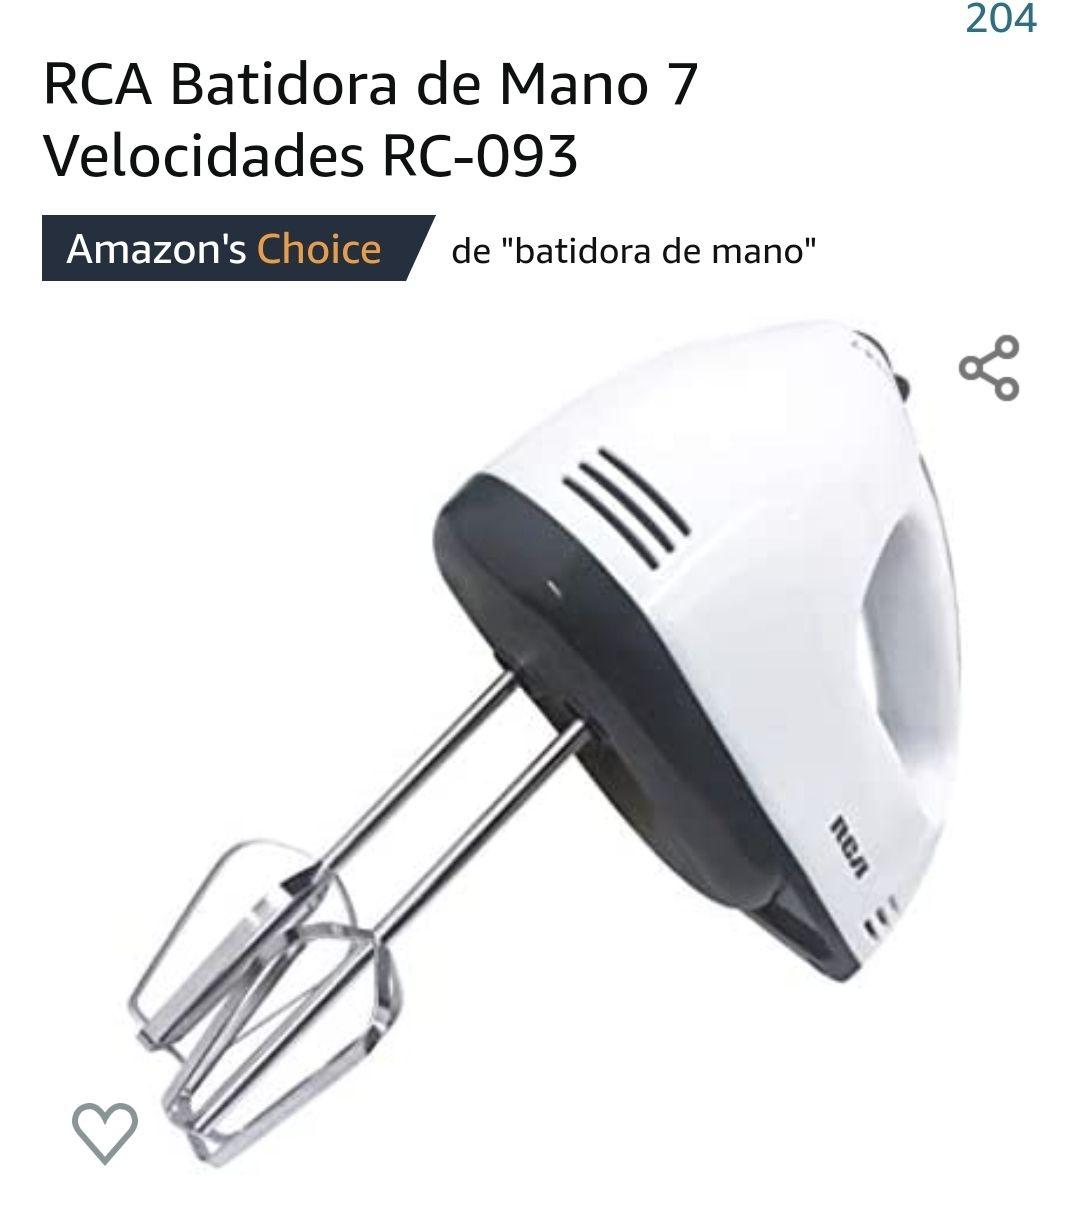 Amazon RCA Batidora de mano